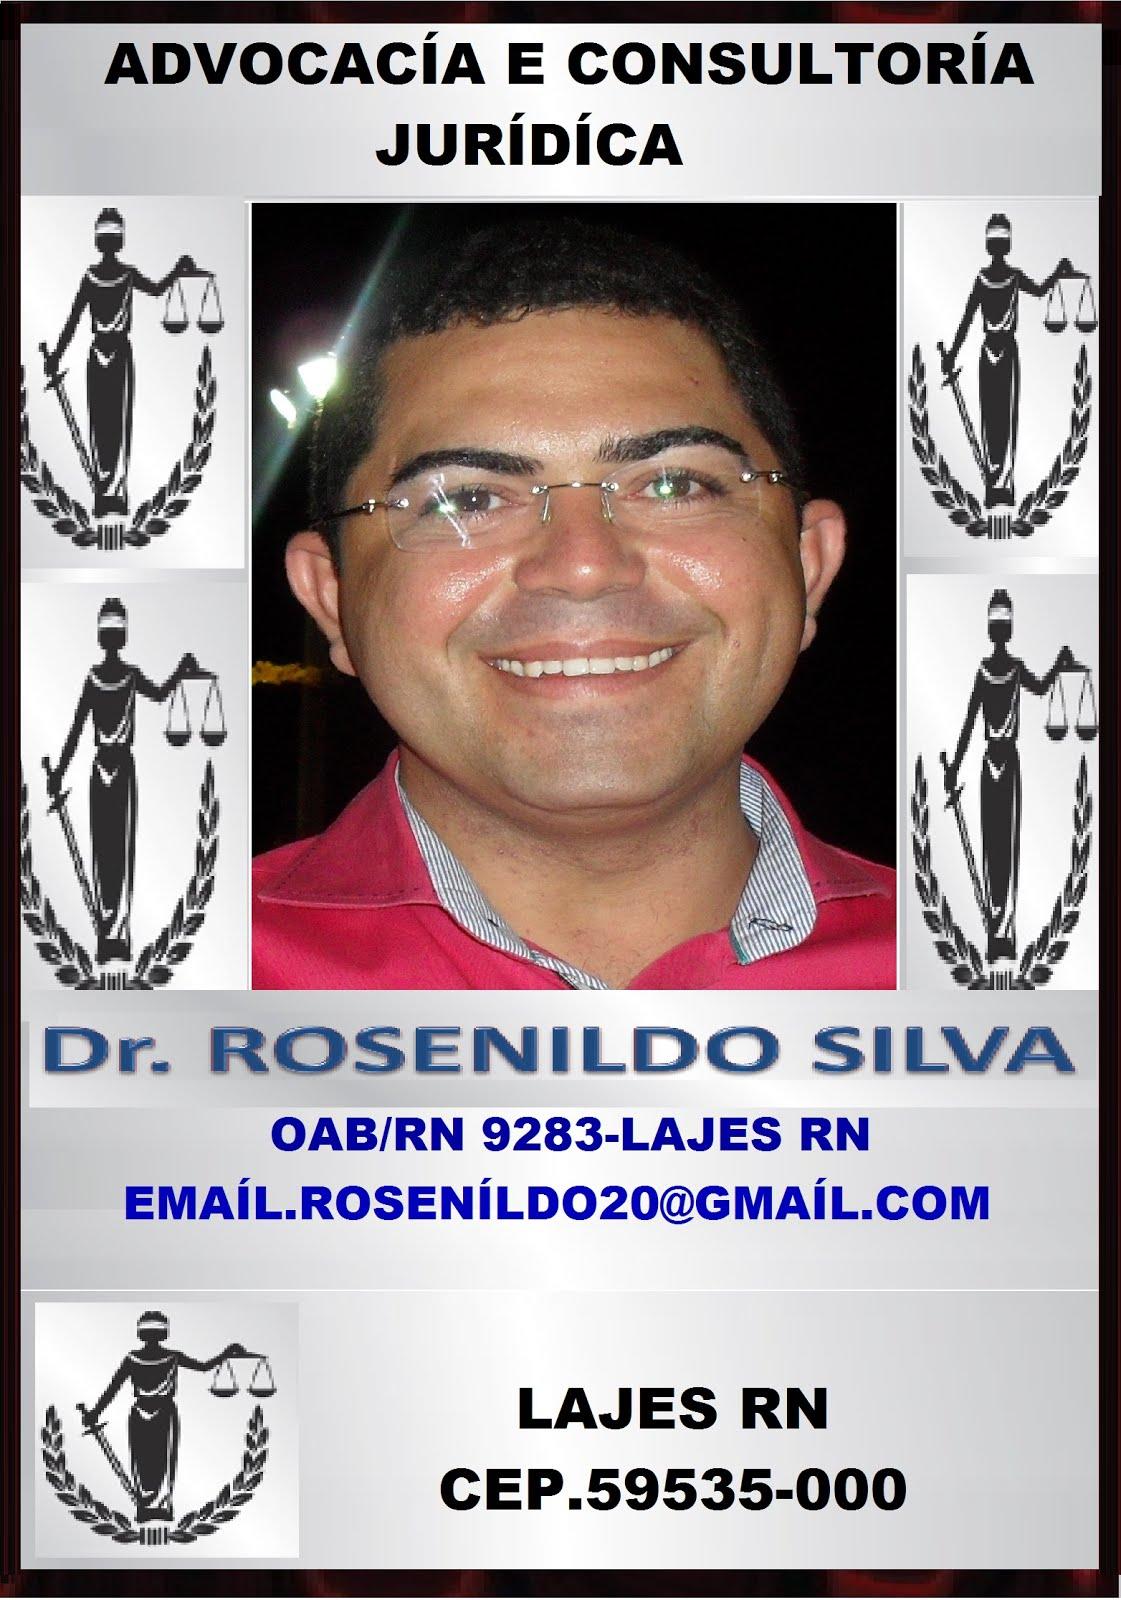 ADVOGADO DR ROSENÍLDO SÍLVA